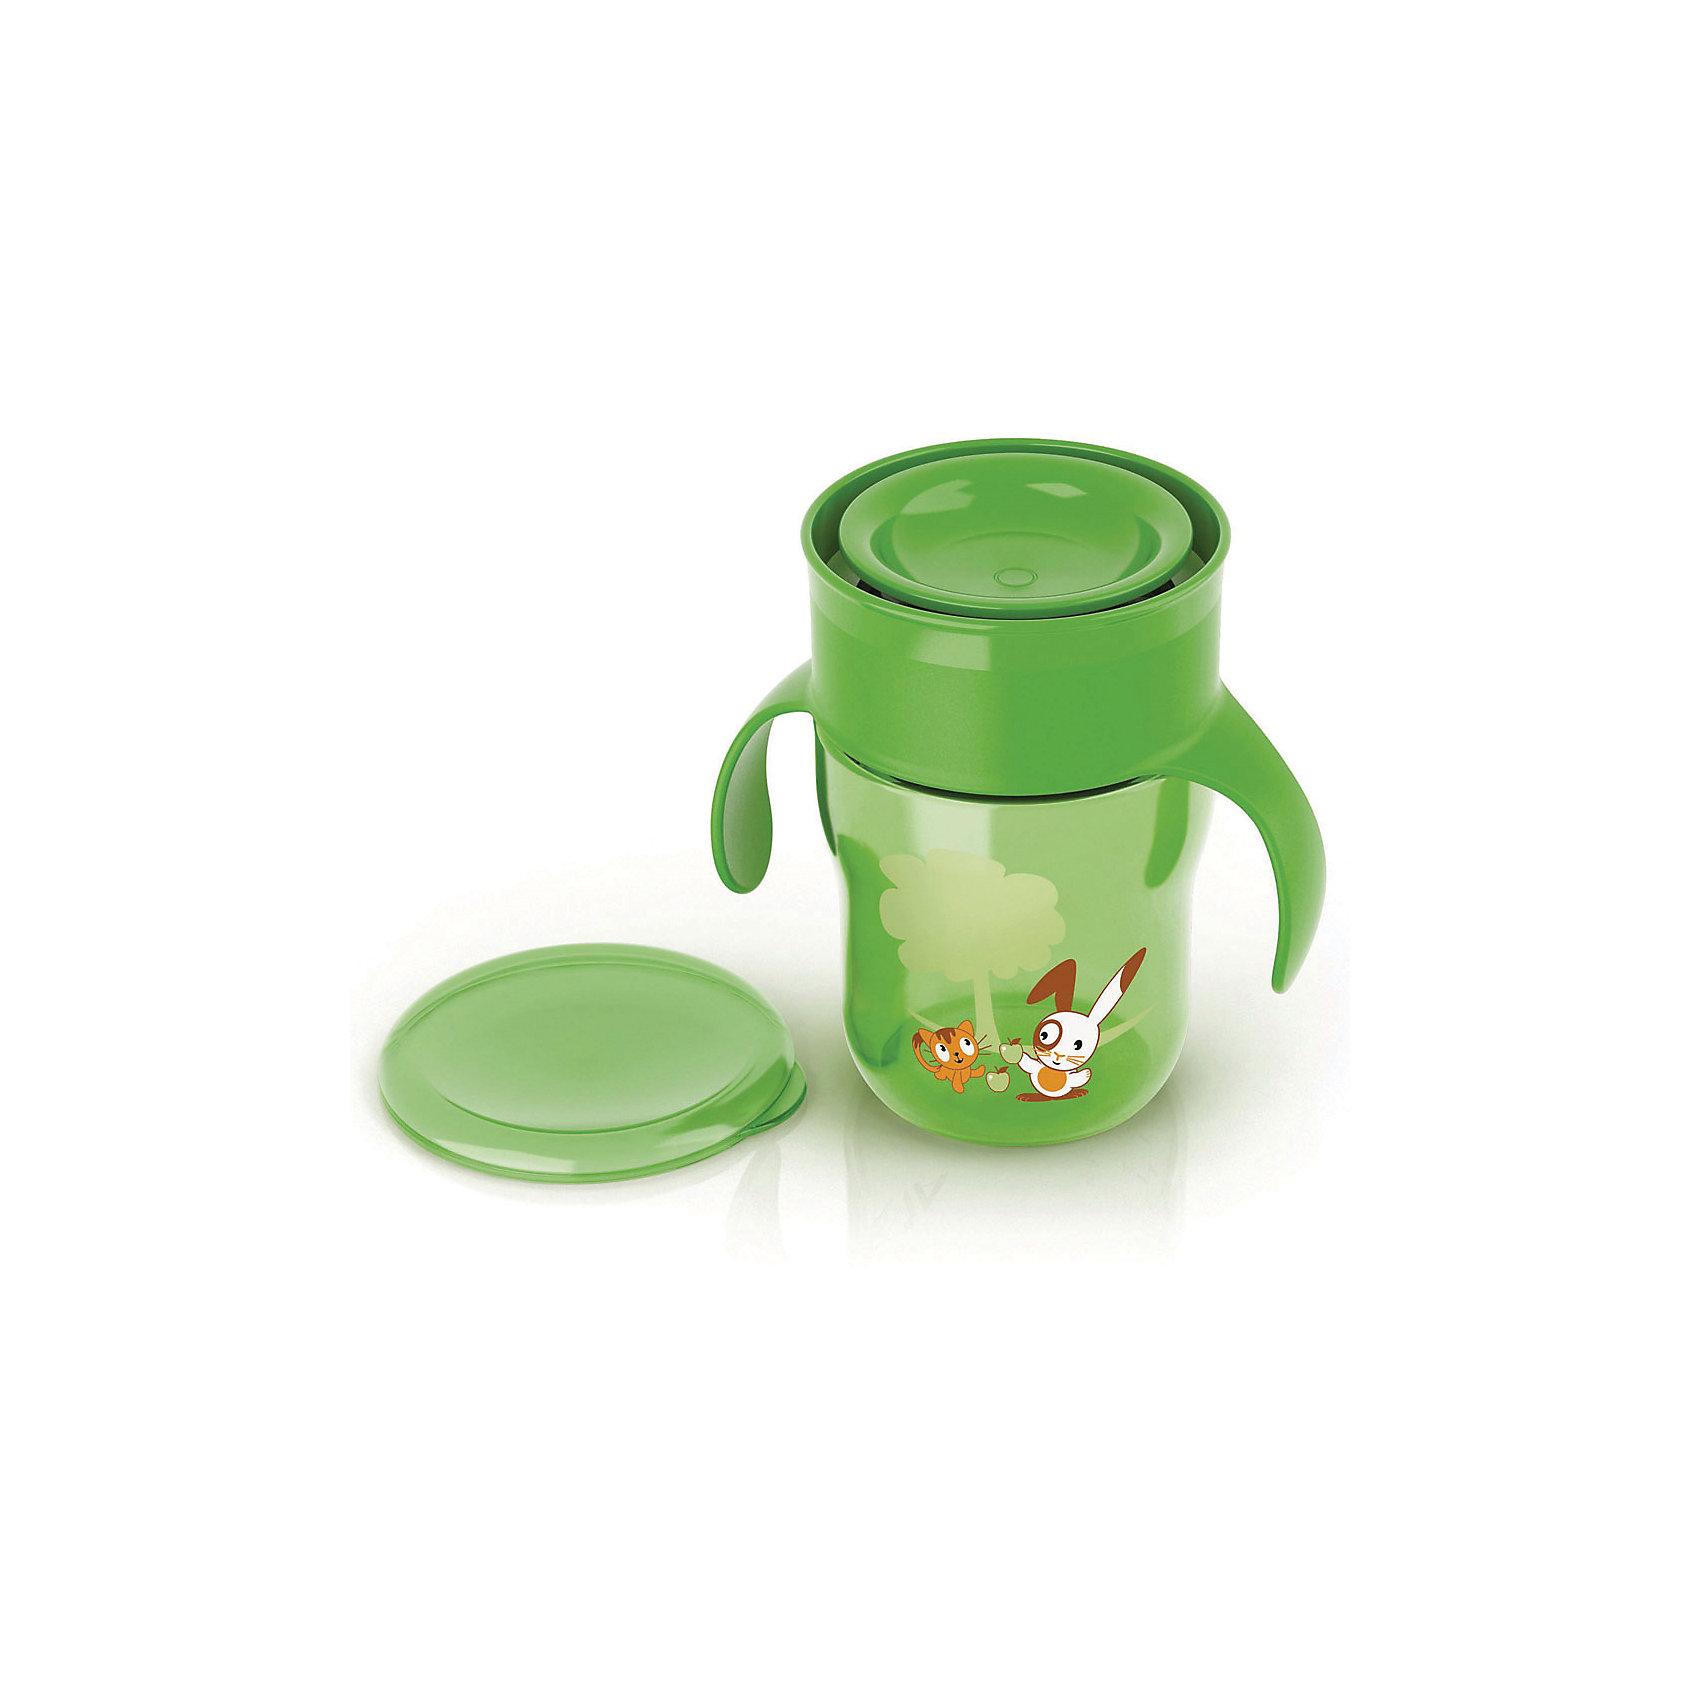 PHILIPS AVENT Поильник-чашка , 260мл, AVENT, зеленый